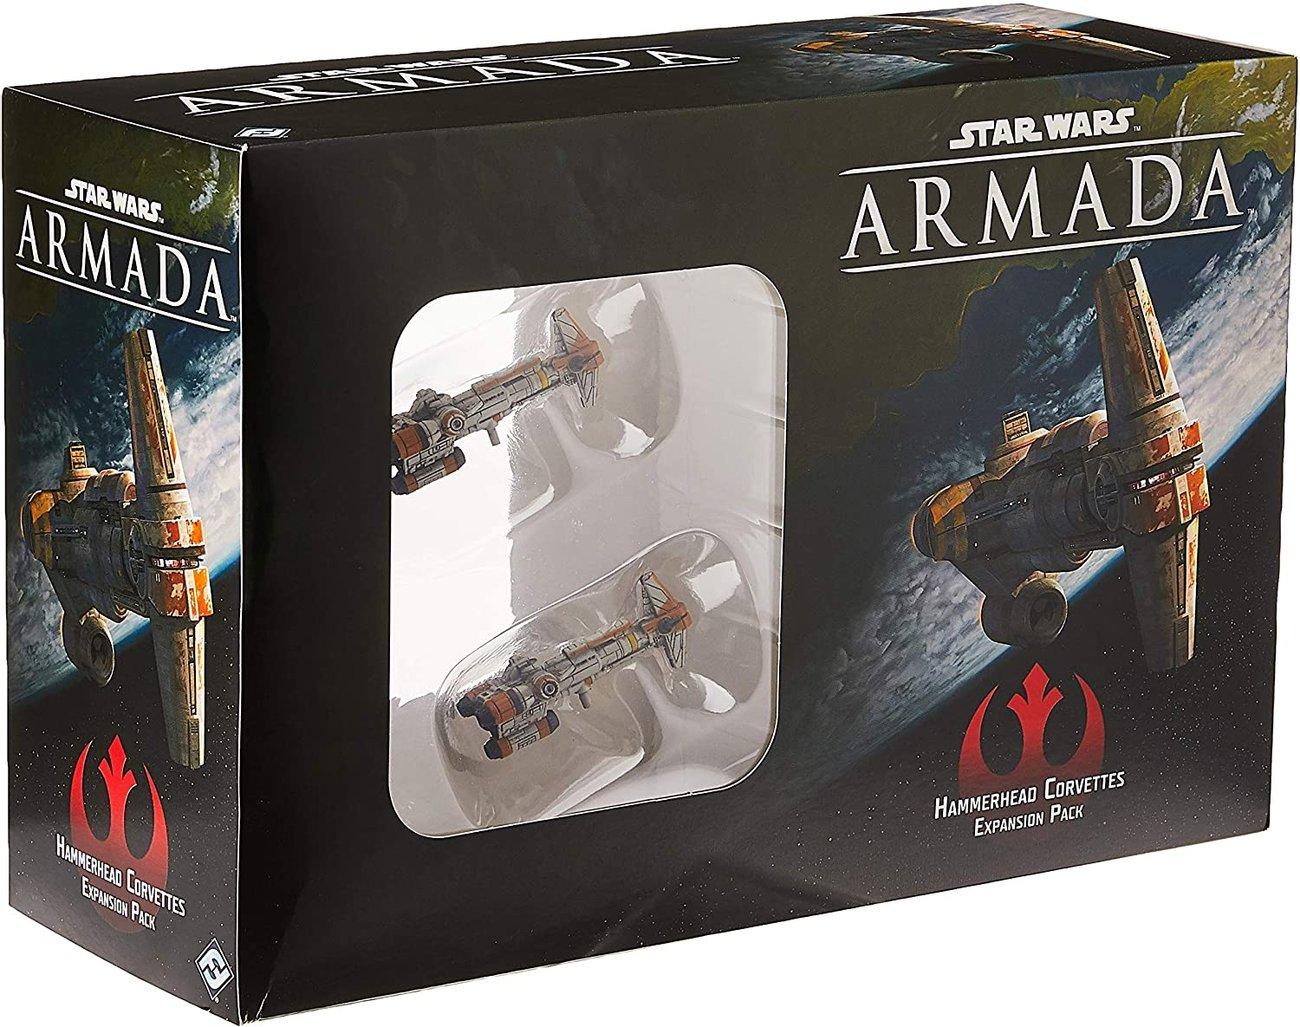 Детска играчка Star Wars Armada Hammerhead Corvette SWM27 колекционерска игра